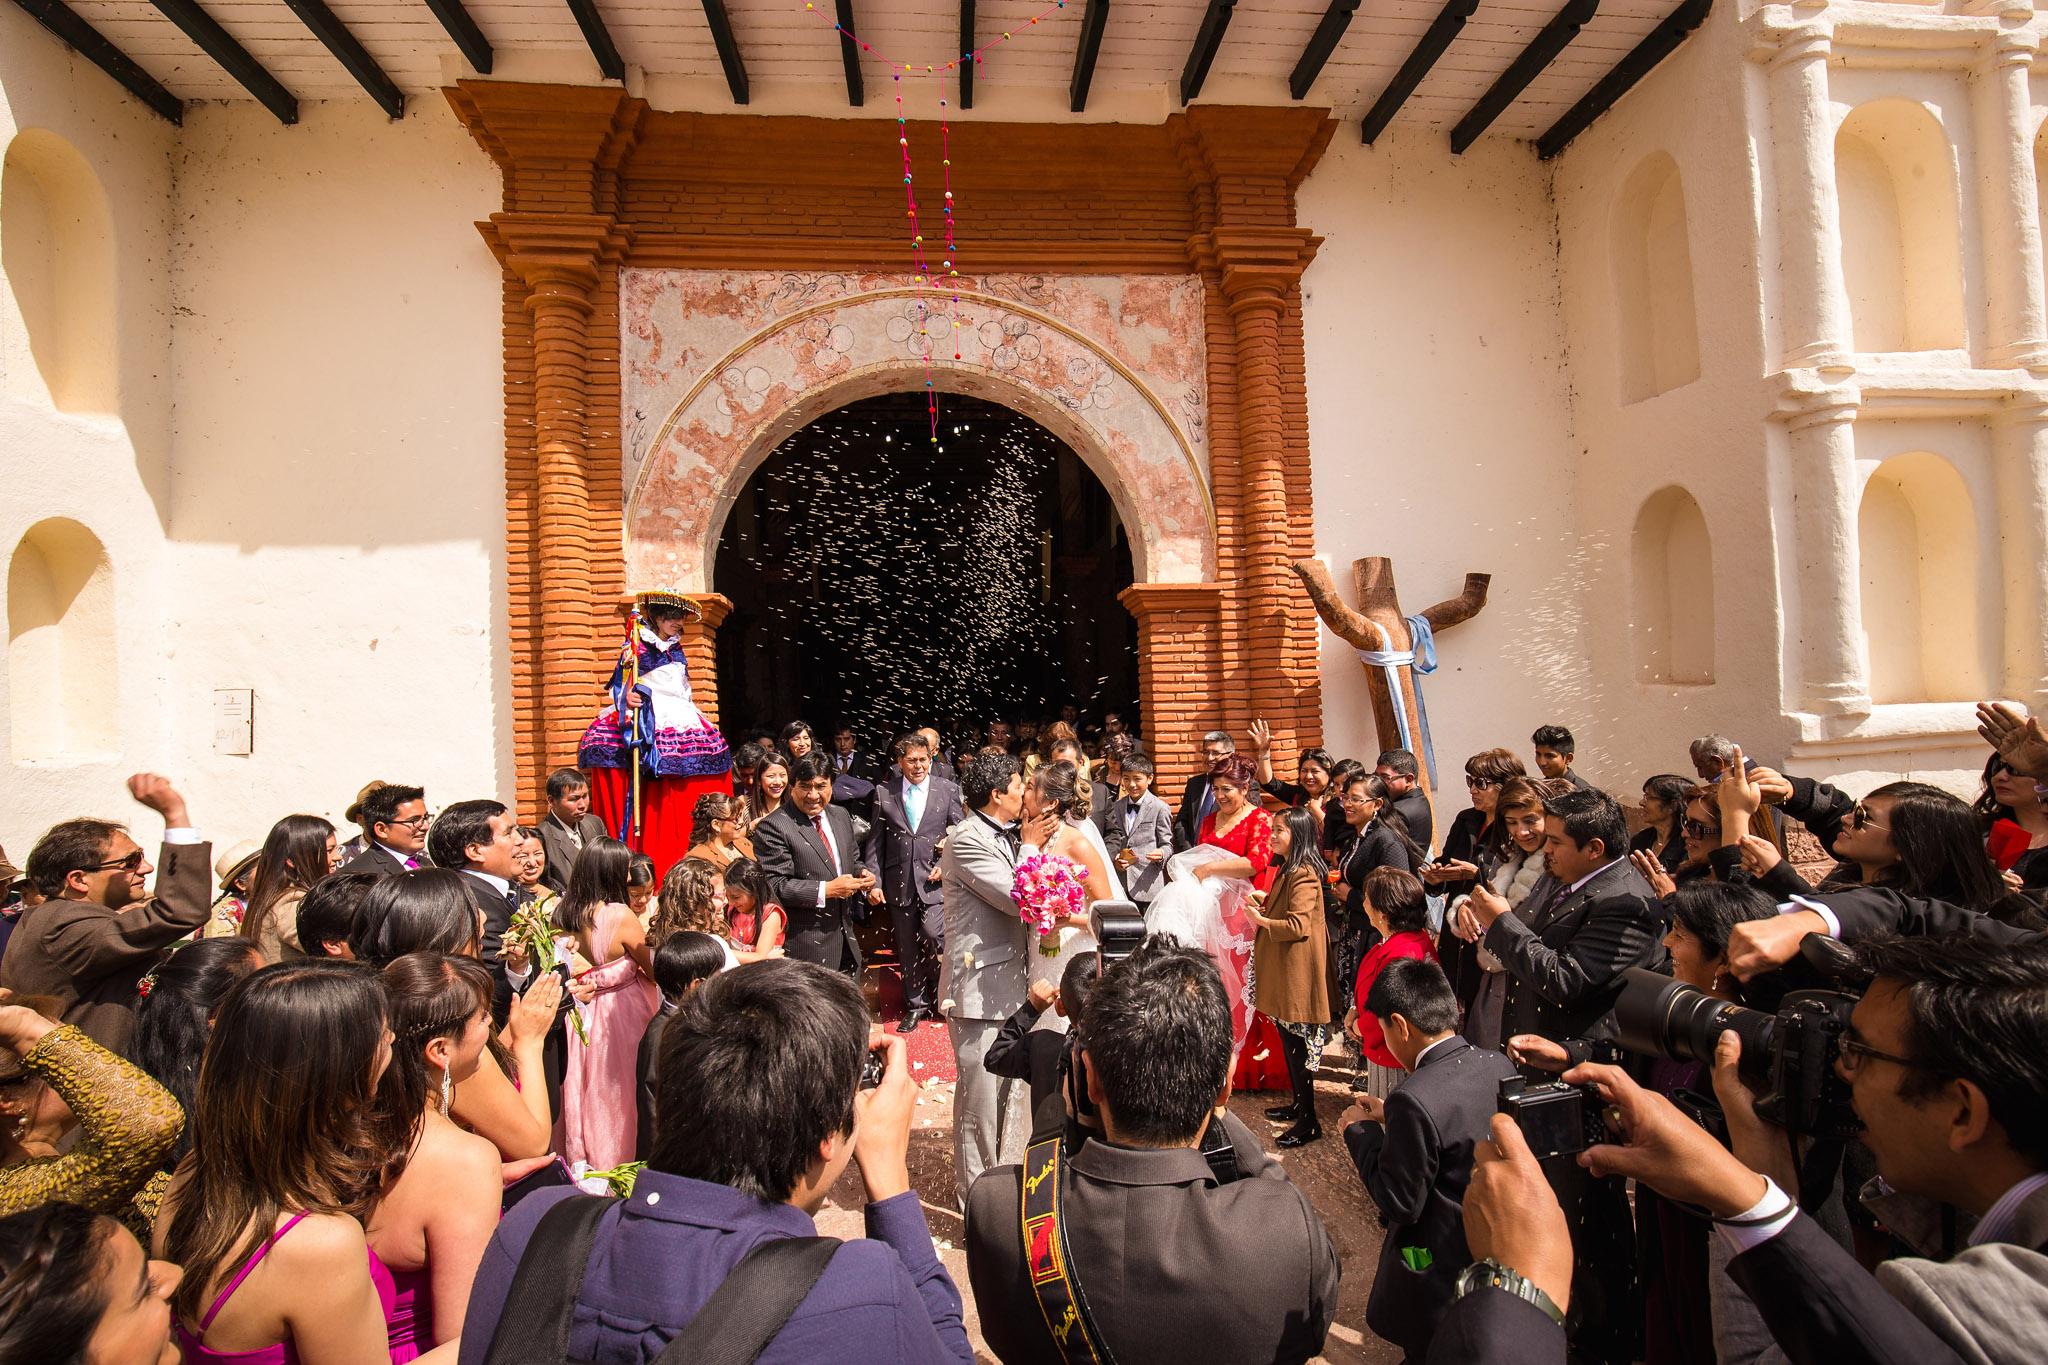 cusco-peru-wedding-traditional-costumes